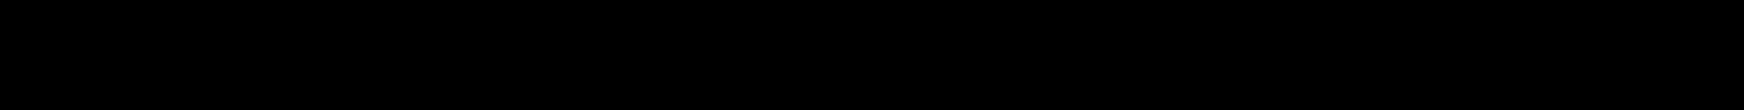 cfdicnbd-webfont.ttf